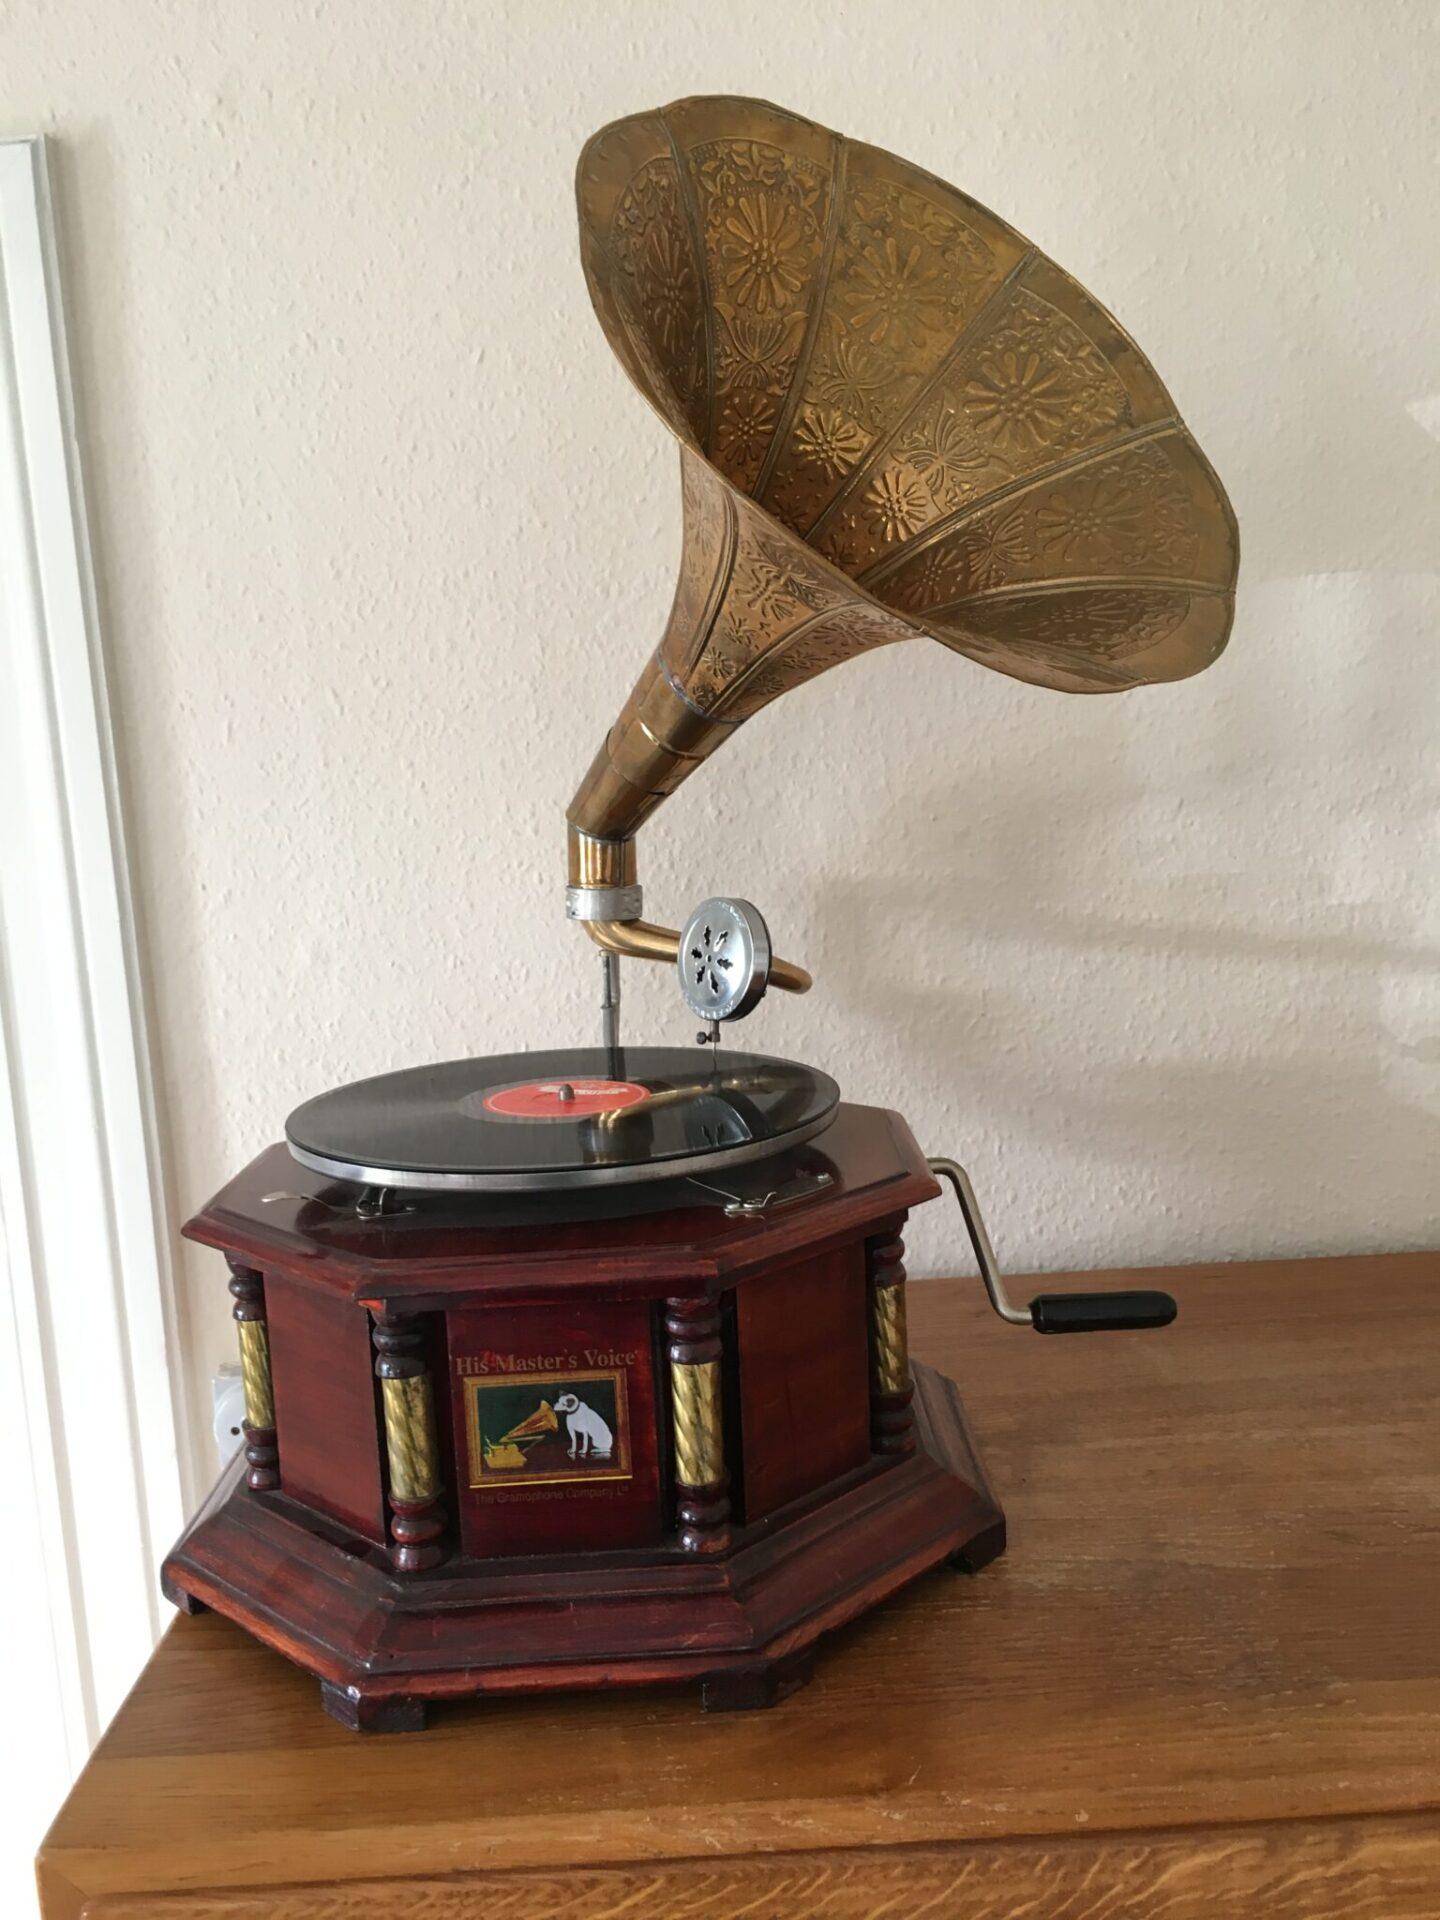 His Master Voice, grammofon, Kopi pris 500 kr